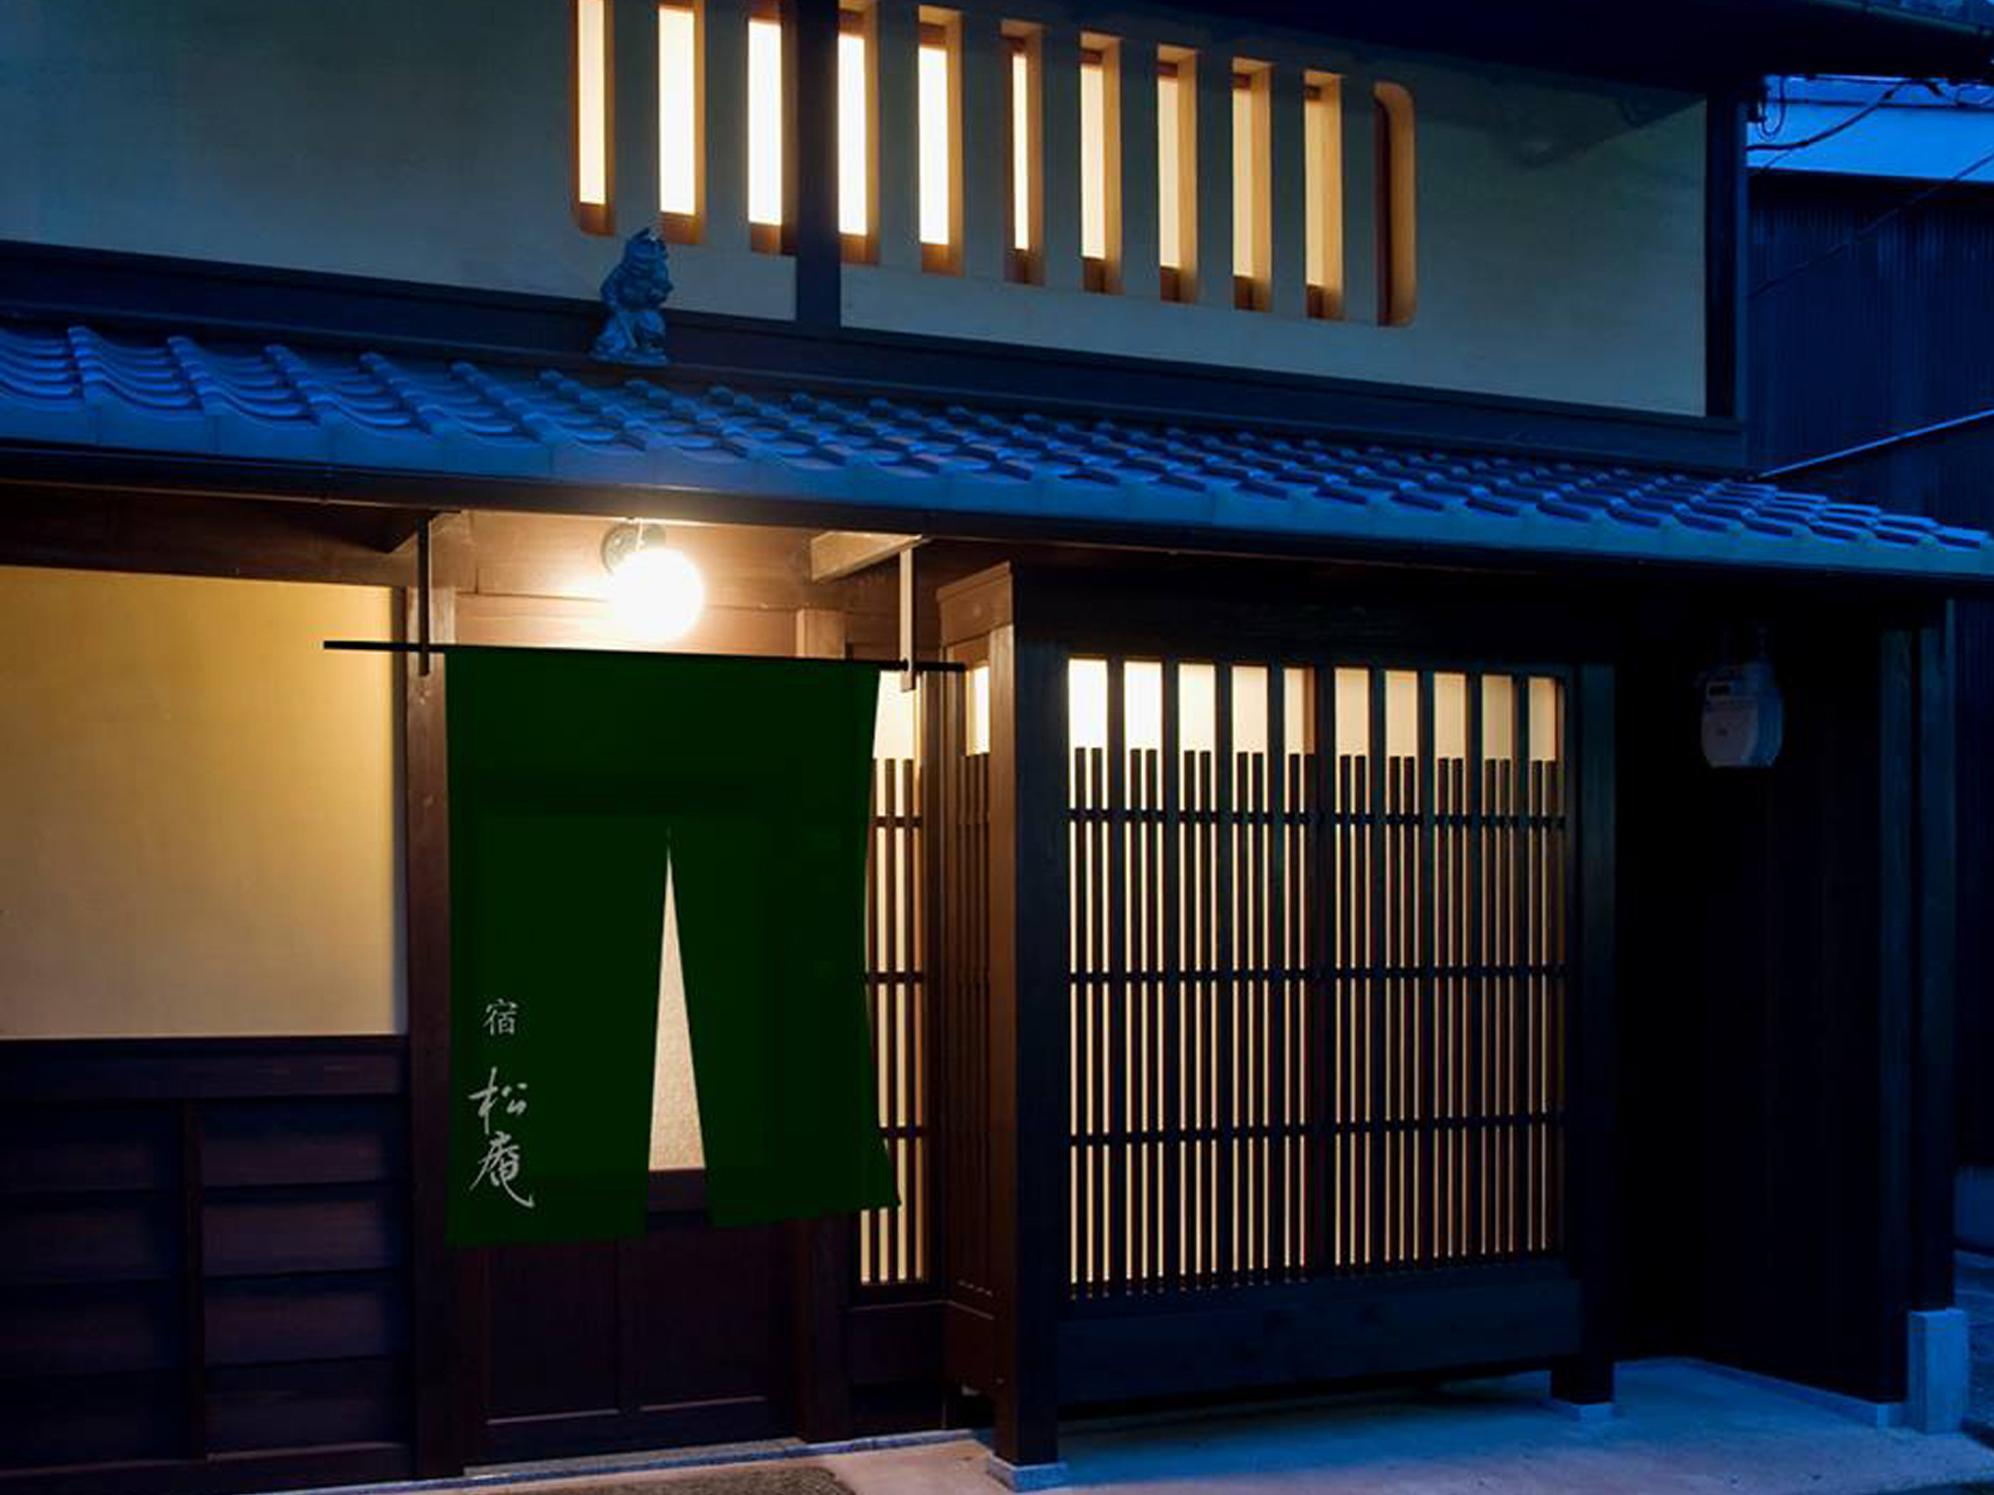 Shouan The Kyoto Machiya Inn Shouan The Kyoto Machiya Inn